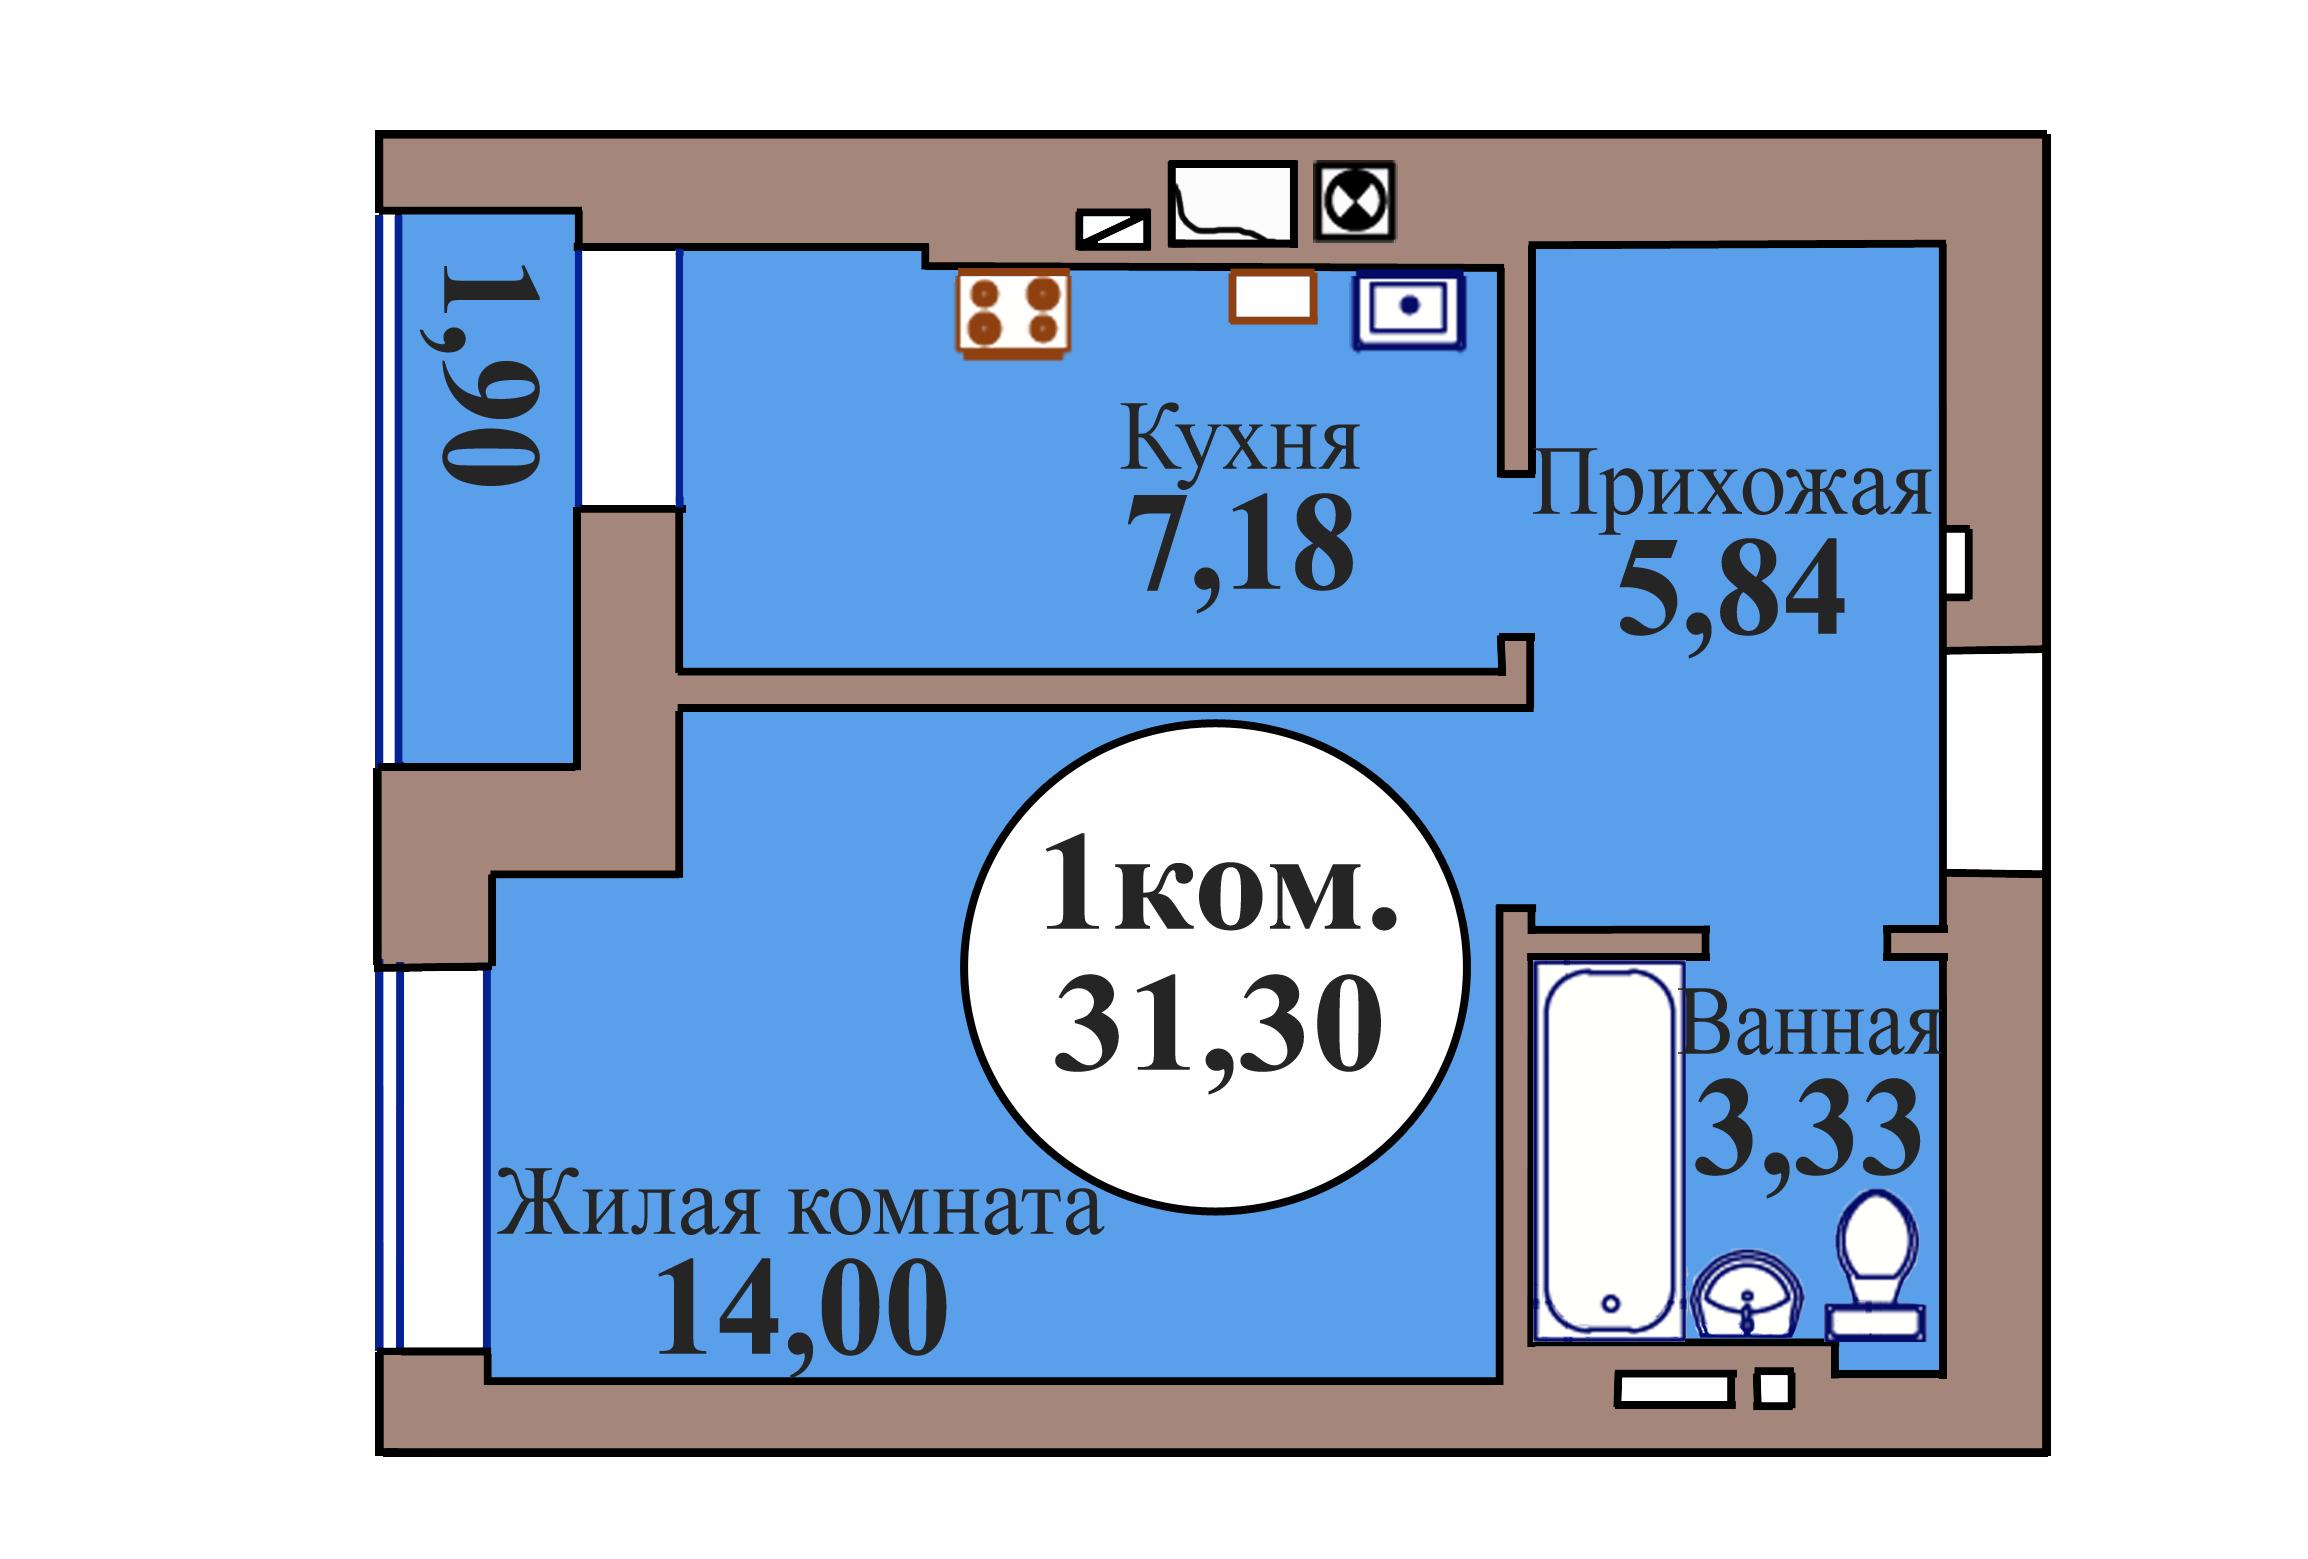 1-комн. кв. по ГП дом №3, МКР Васильково, кв. 12 в Калининграде